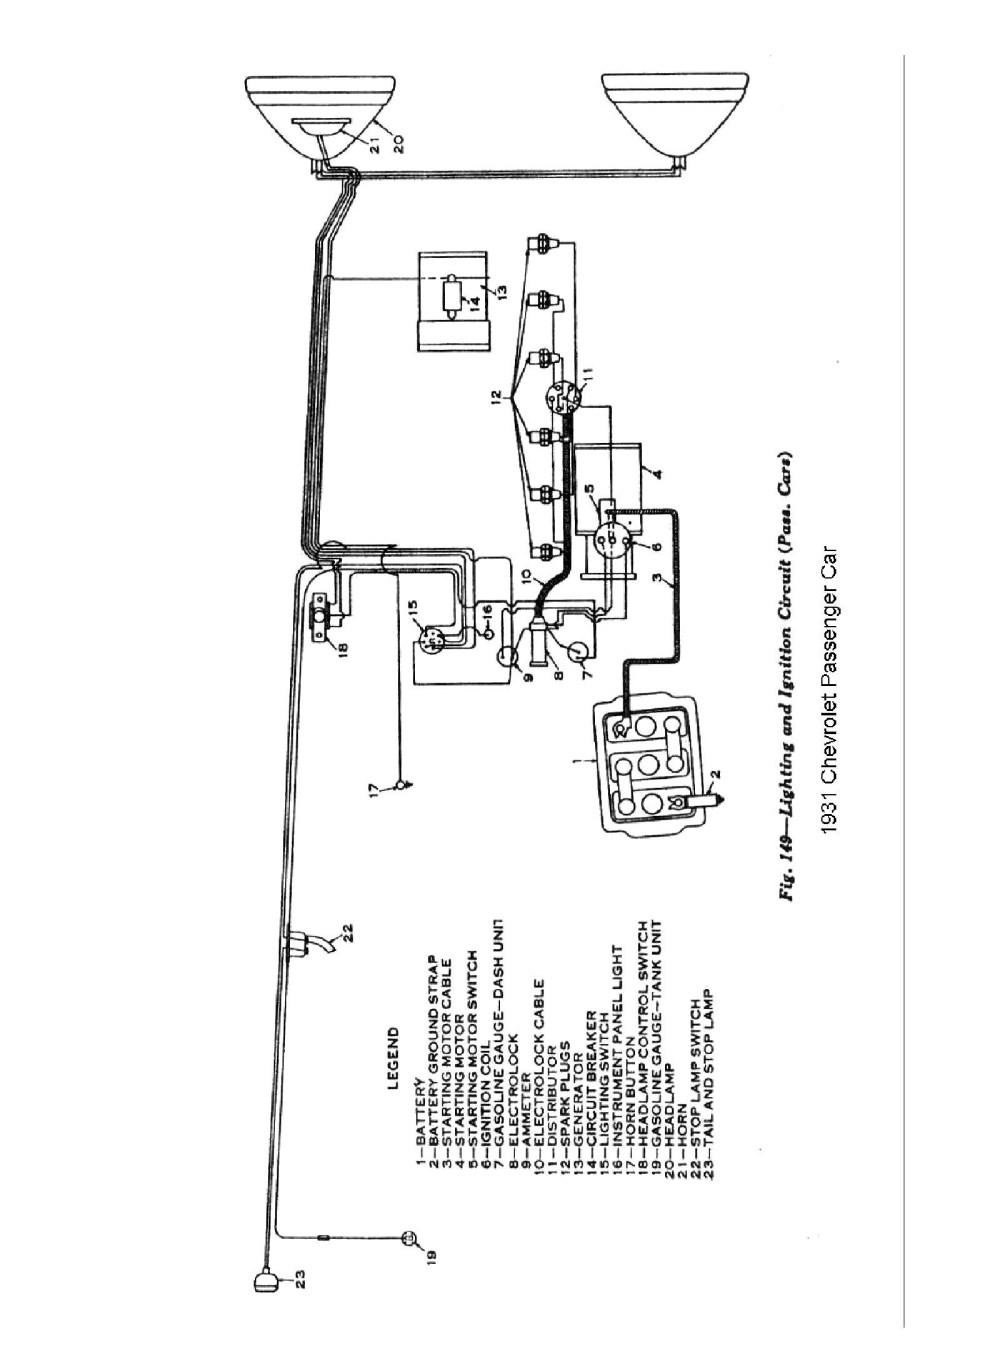 medium resolution of 1931 1931 wiring diagrams 1931 lighting ignition unique chevy ignition coil wiring diagram diagram